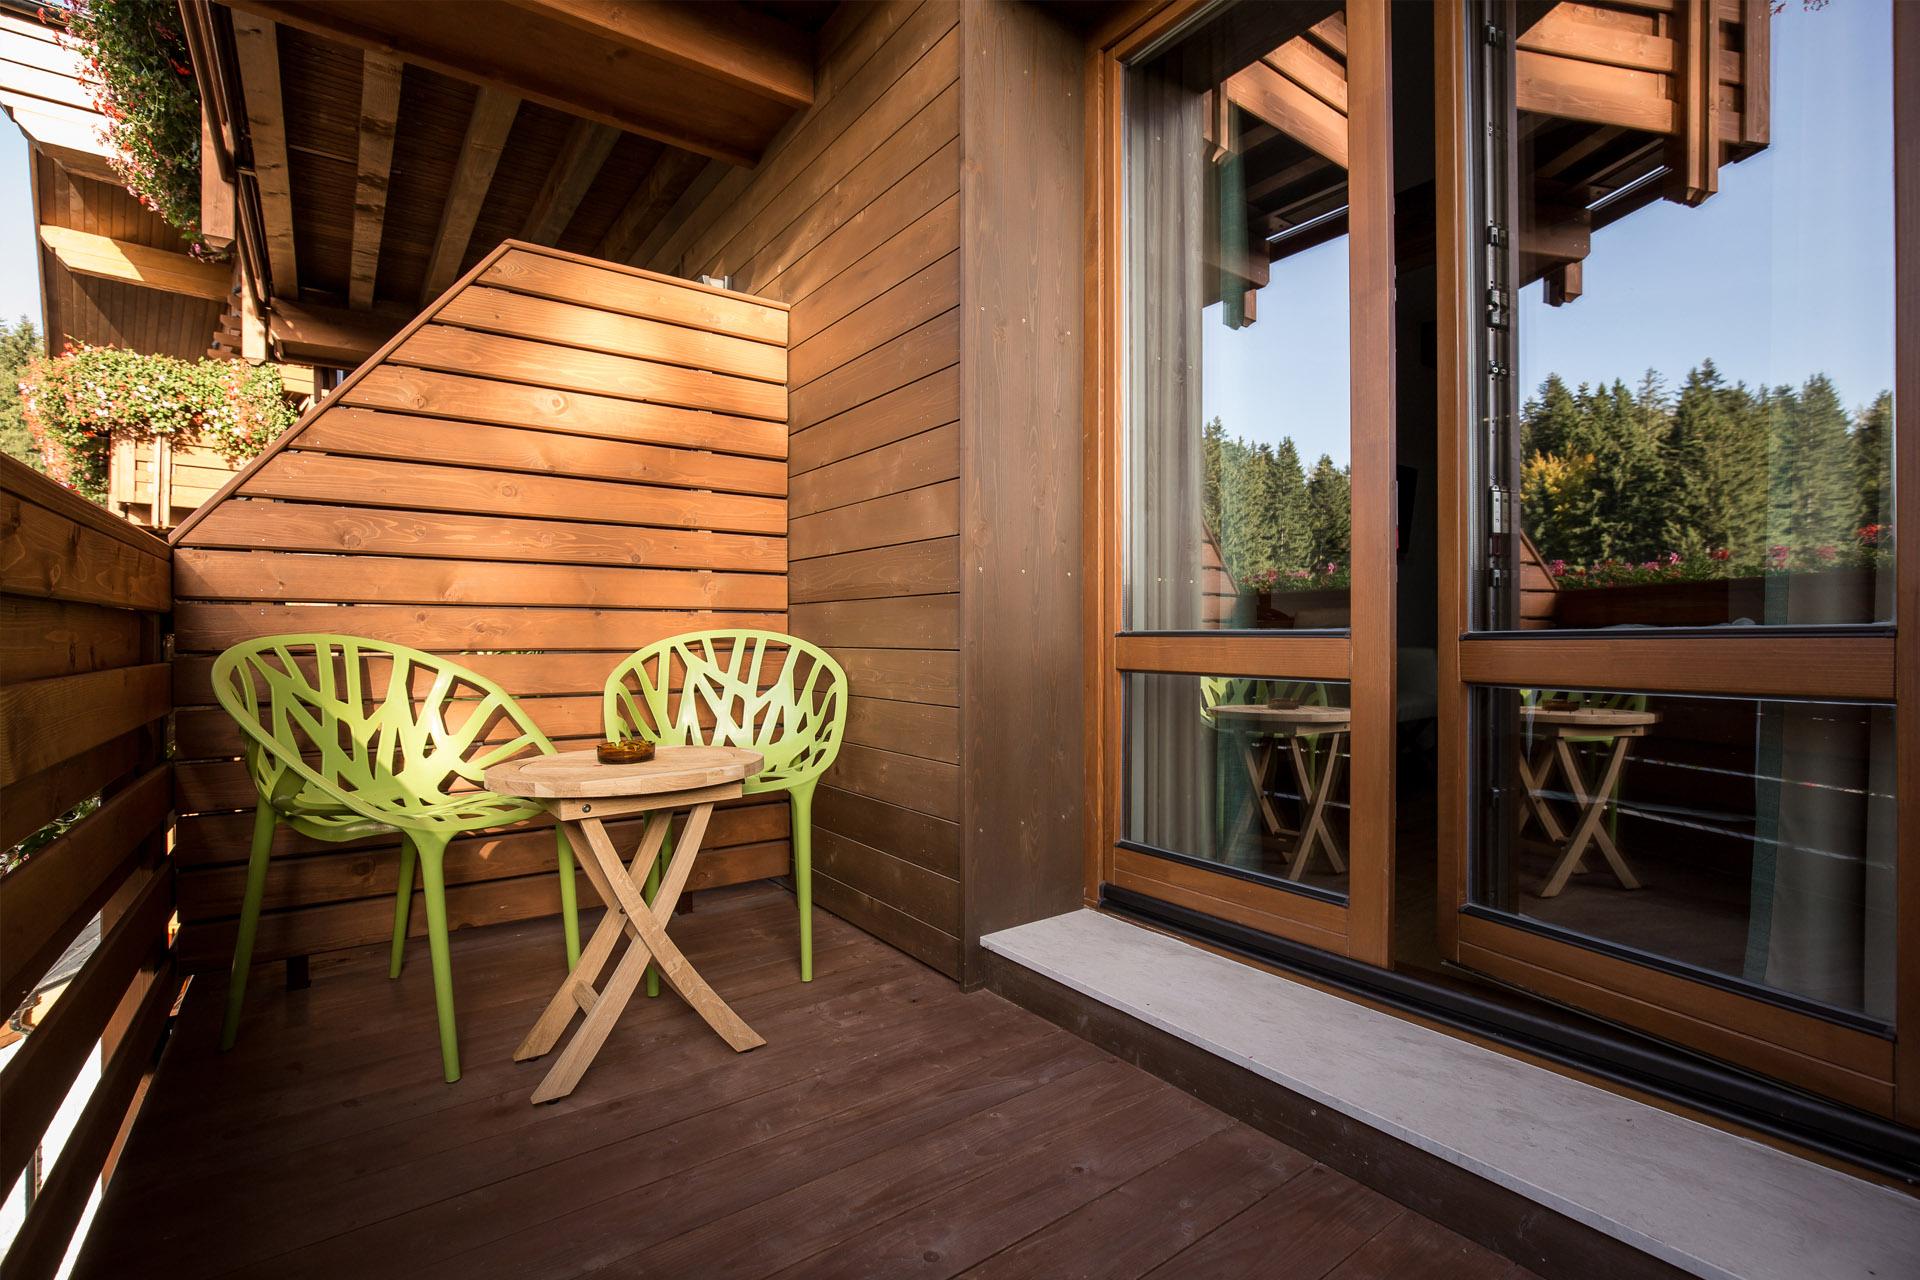 Craciun - Teleferic Grand Hotel - 4 Seasons